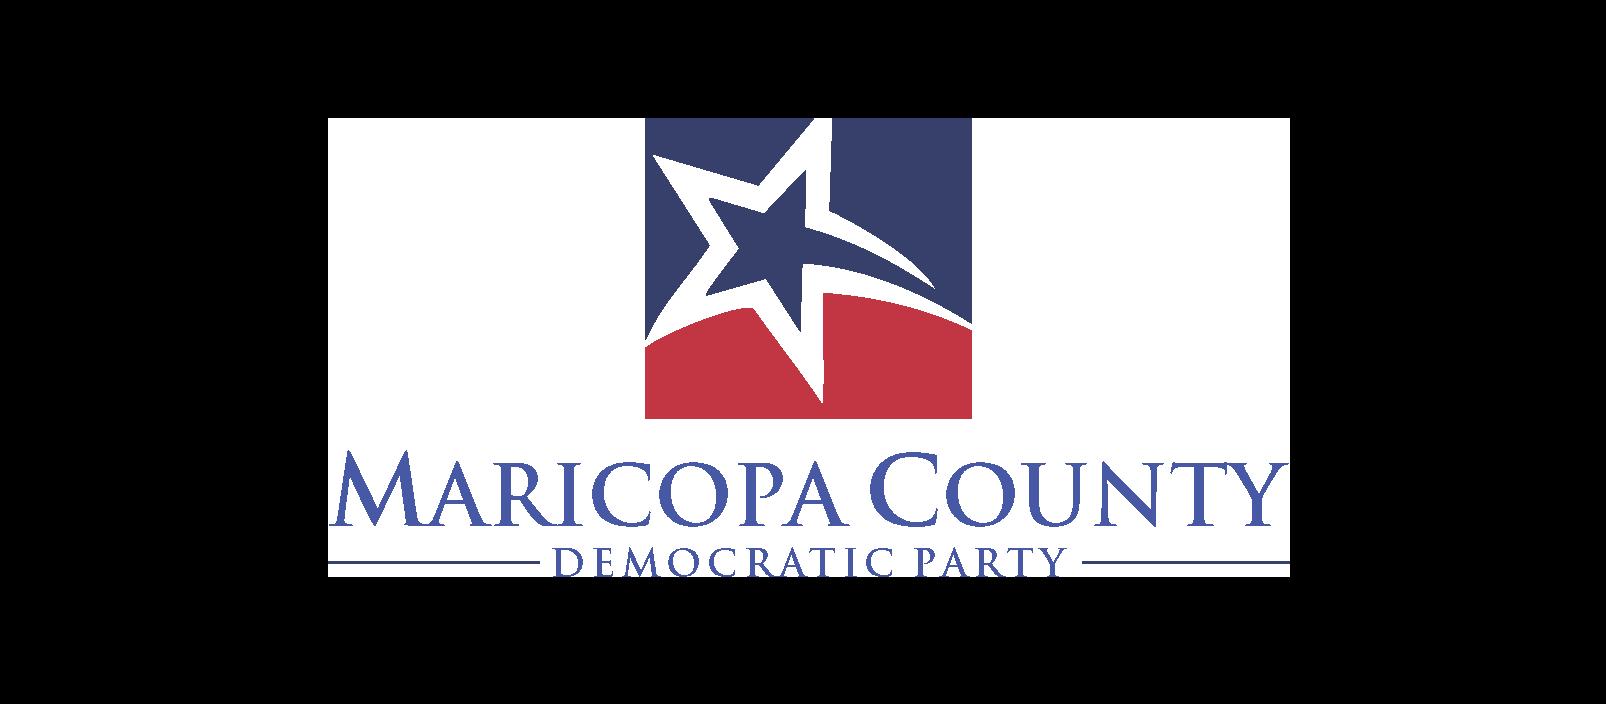 MCDP logo